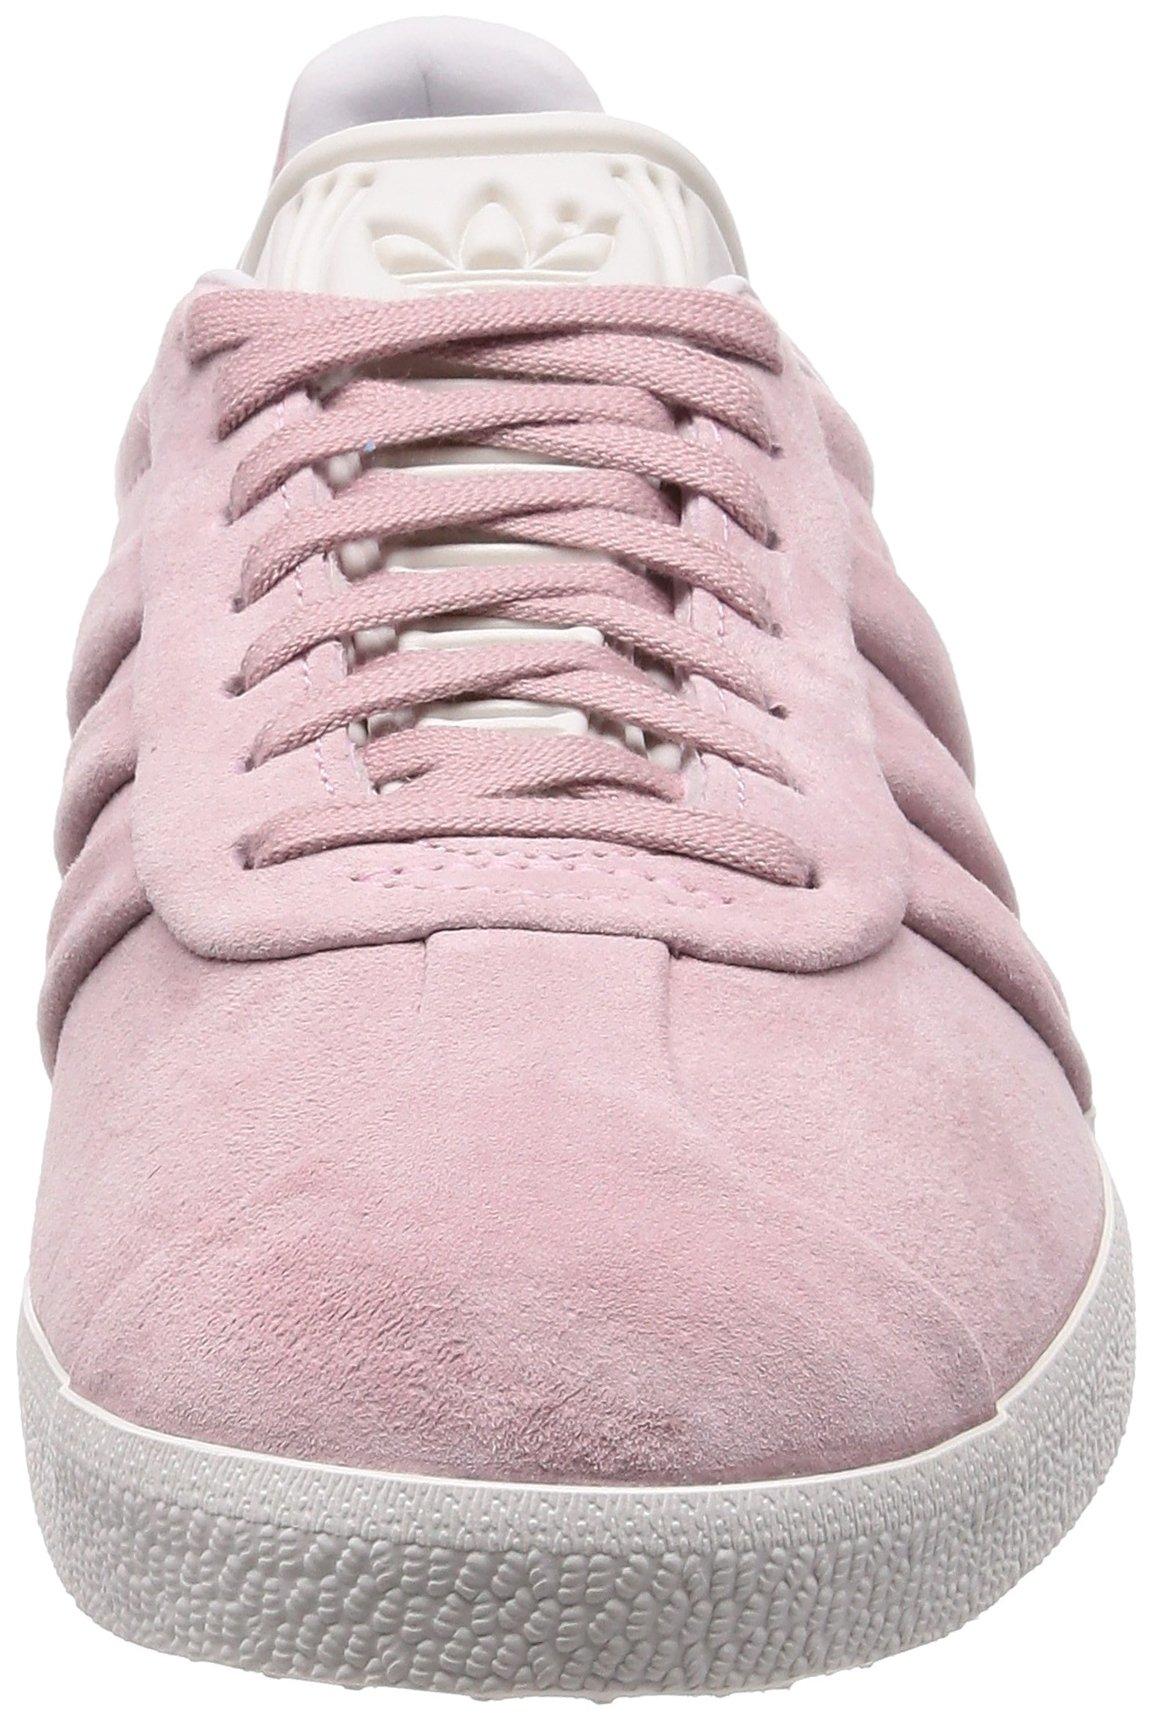 adidas Gazelle Stitch And, Scarpe da Fitness Donna 4 spesavip